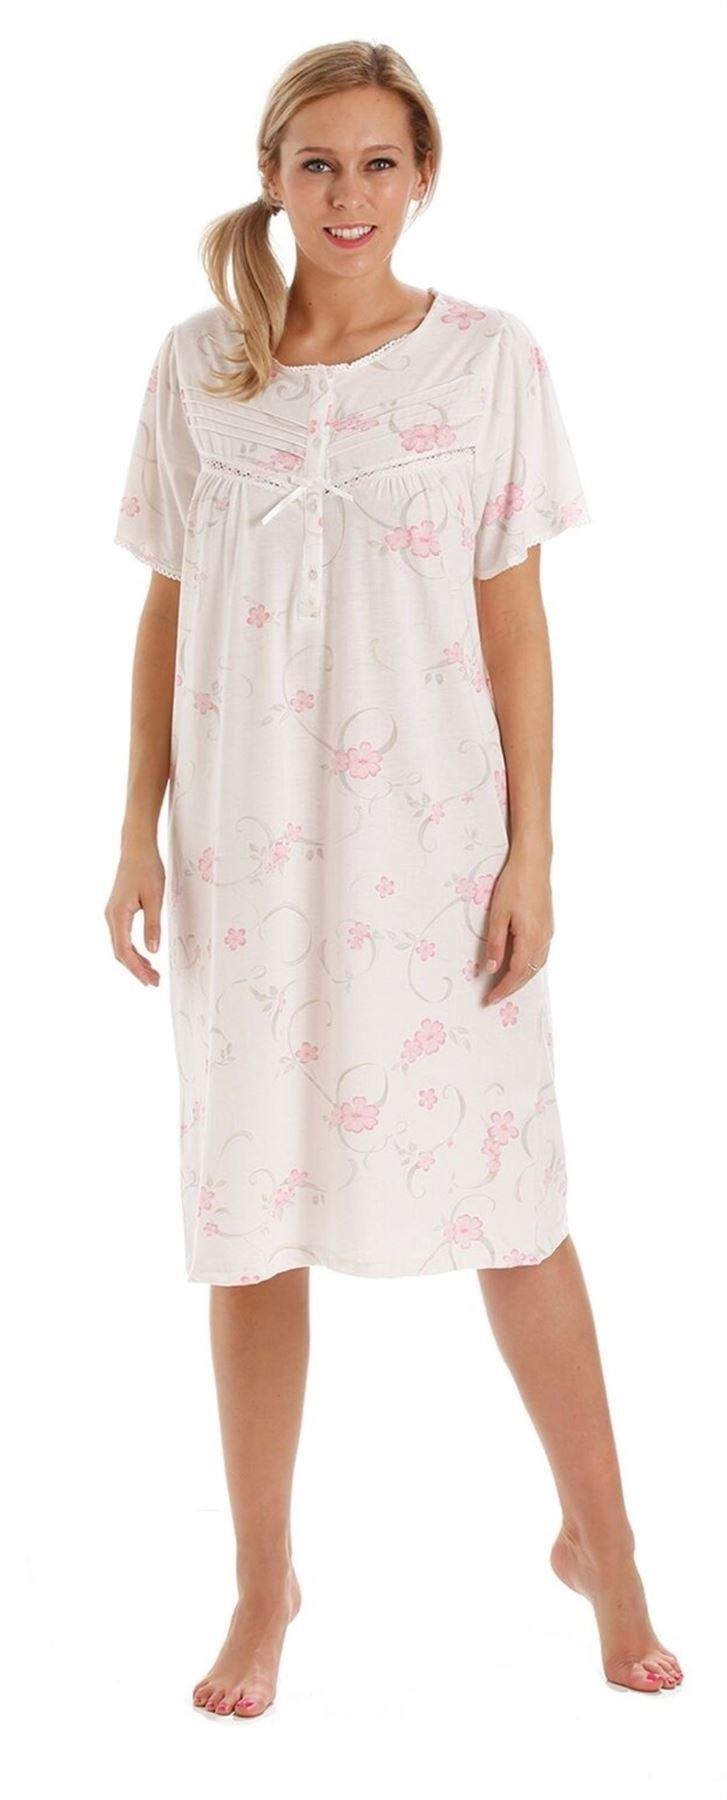 Undercover Womens Poly Cotton Short Sleeve Button Through Nightie Nightdress MN12